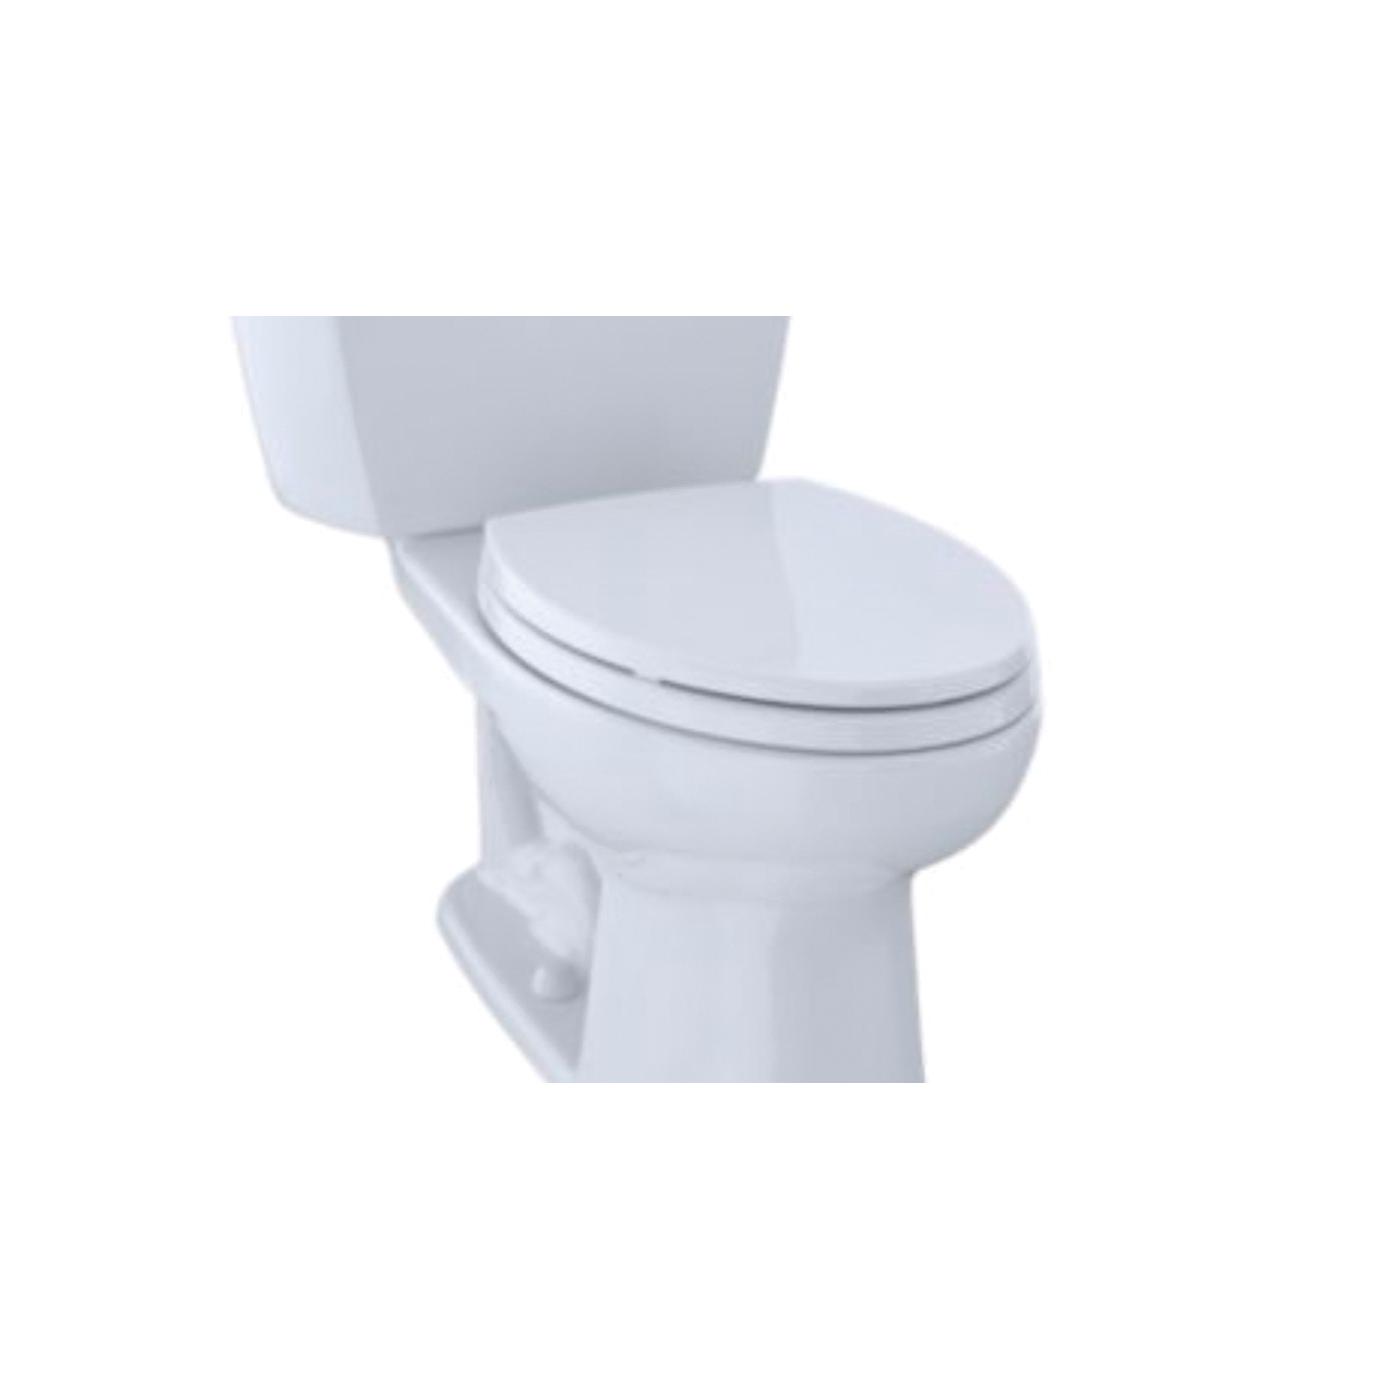 Toto® Eco Drake® CST744EL#01 2-Piece Close Coupled Toilet, Elongated Front Bowl, 17-5/8 in H Rim, 1.28 gpf, Cotton